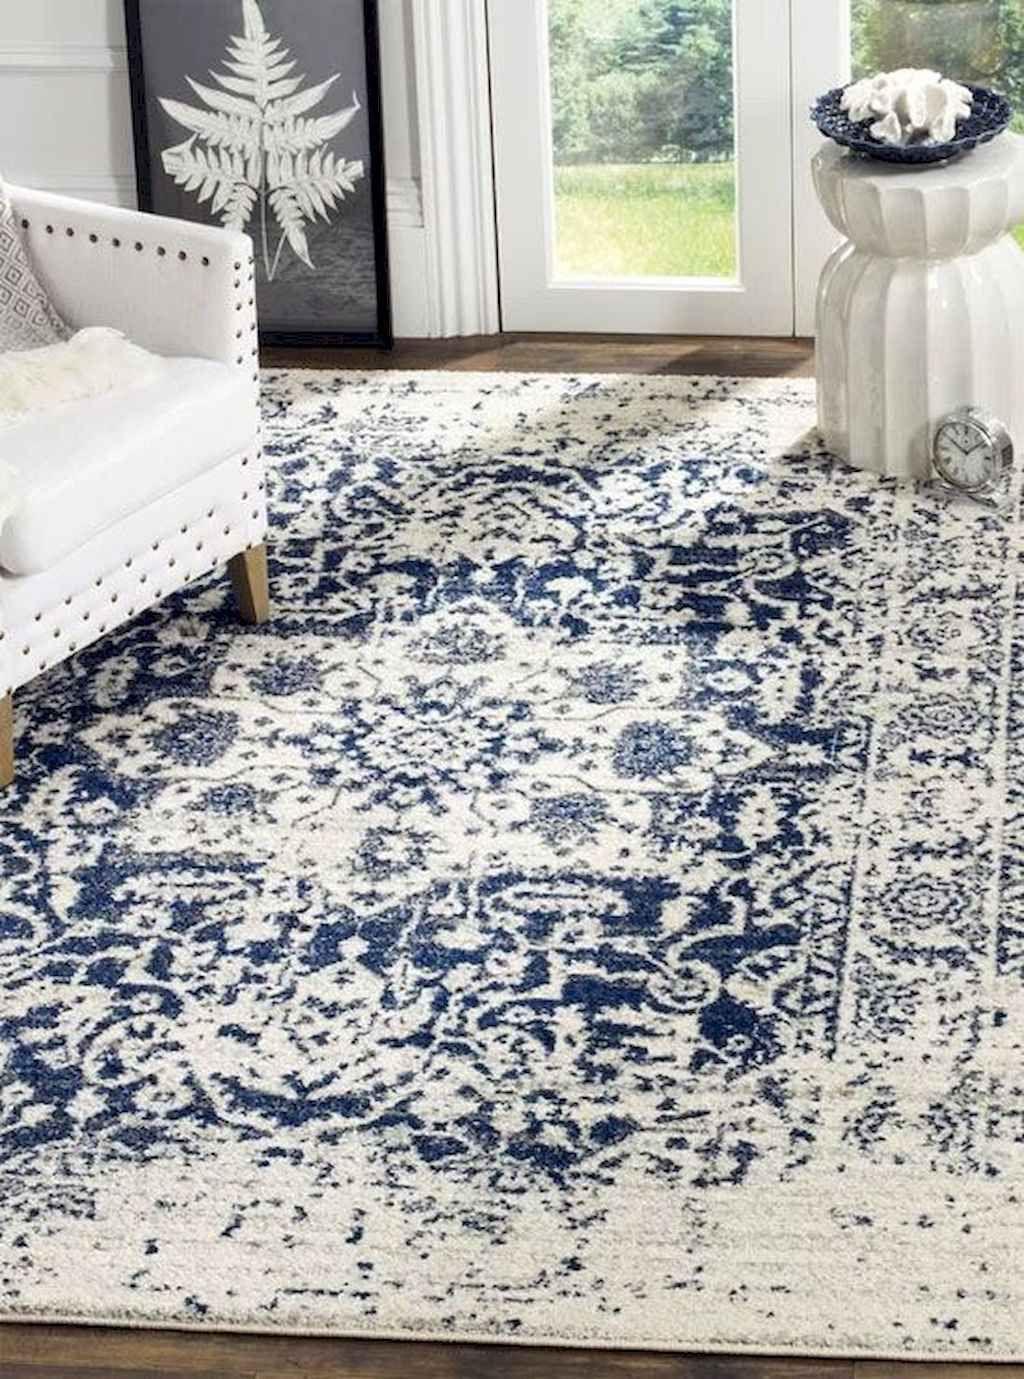 Adorable 75 beautiful rug for farmhouse living room design